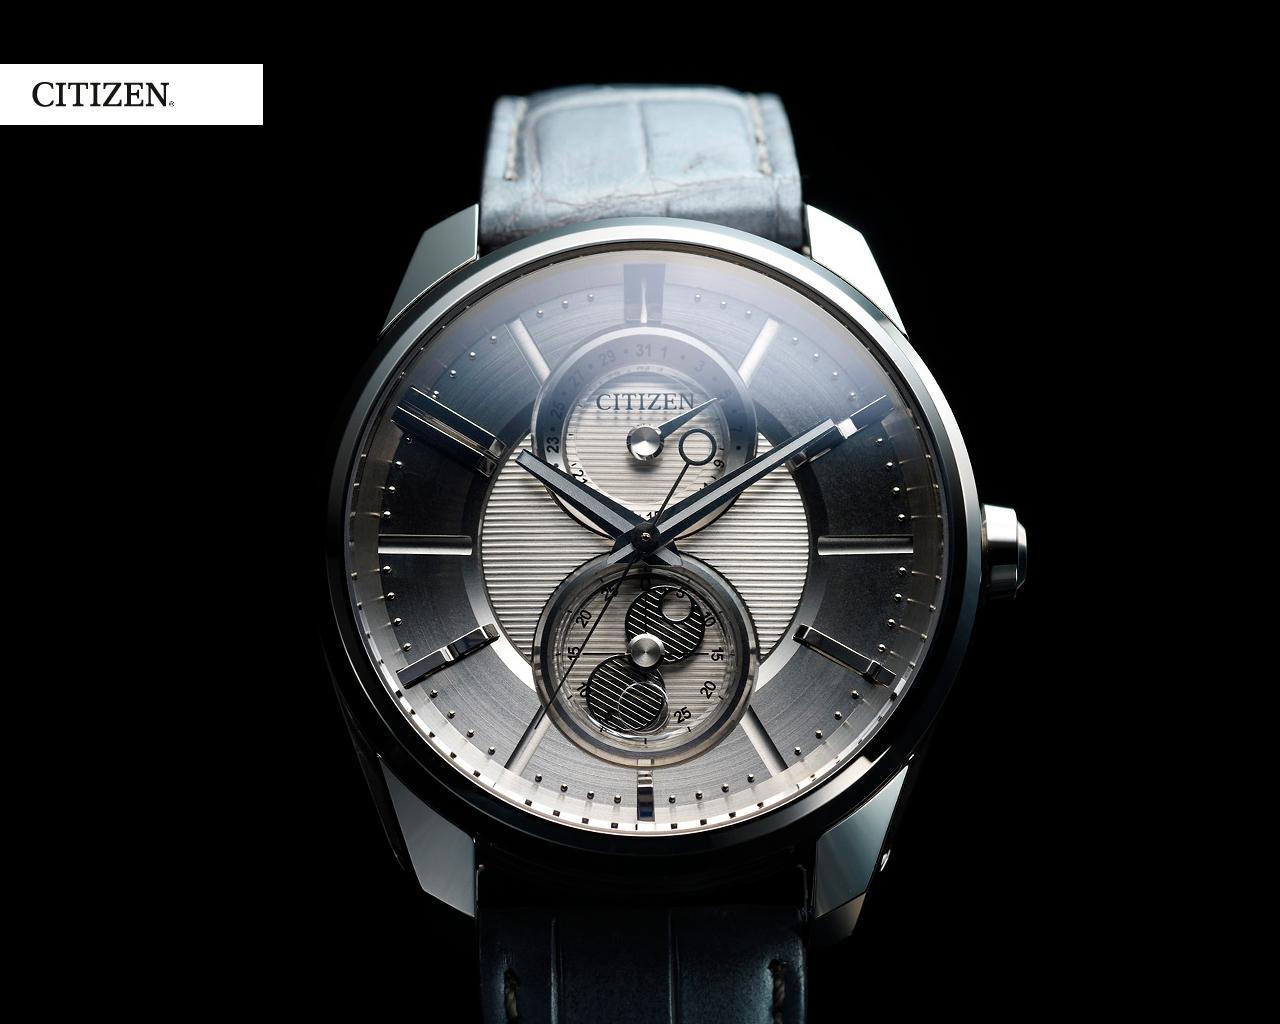 ring bu1020 08a eco drive concept model citizen watch